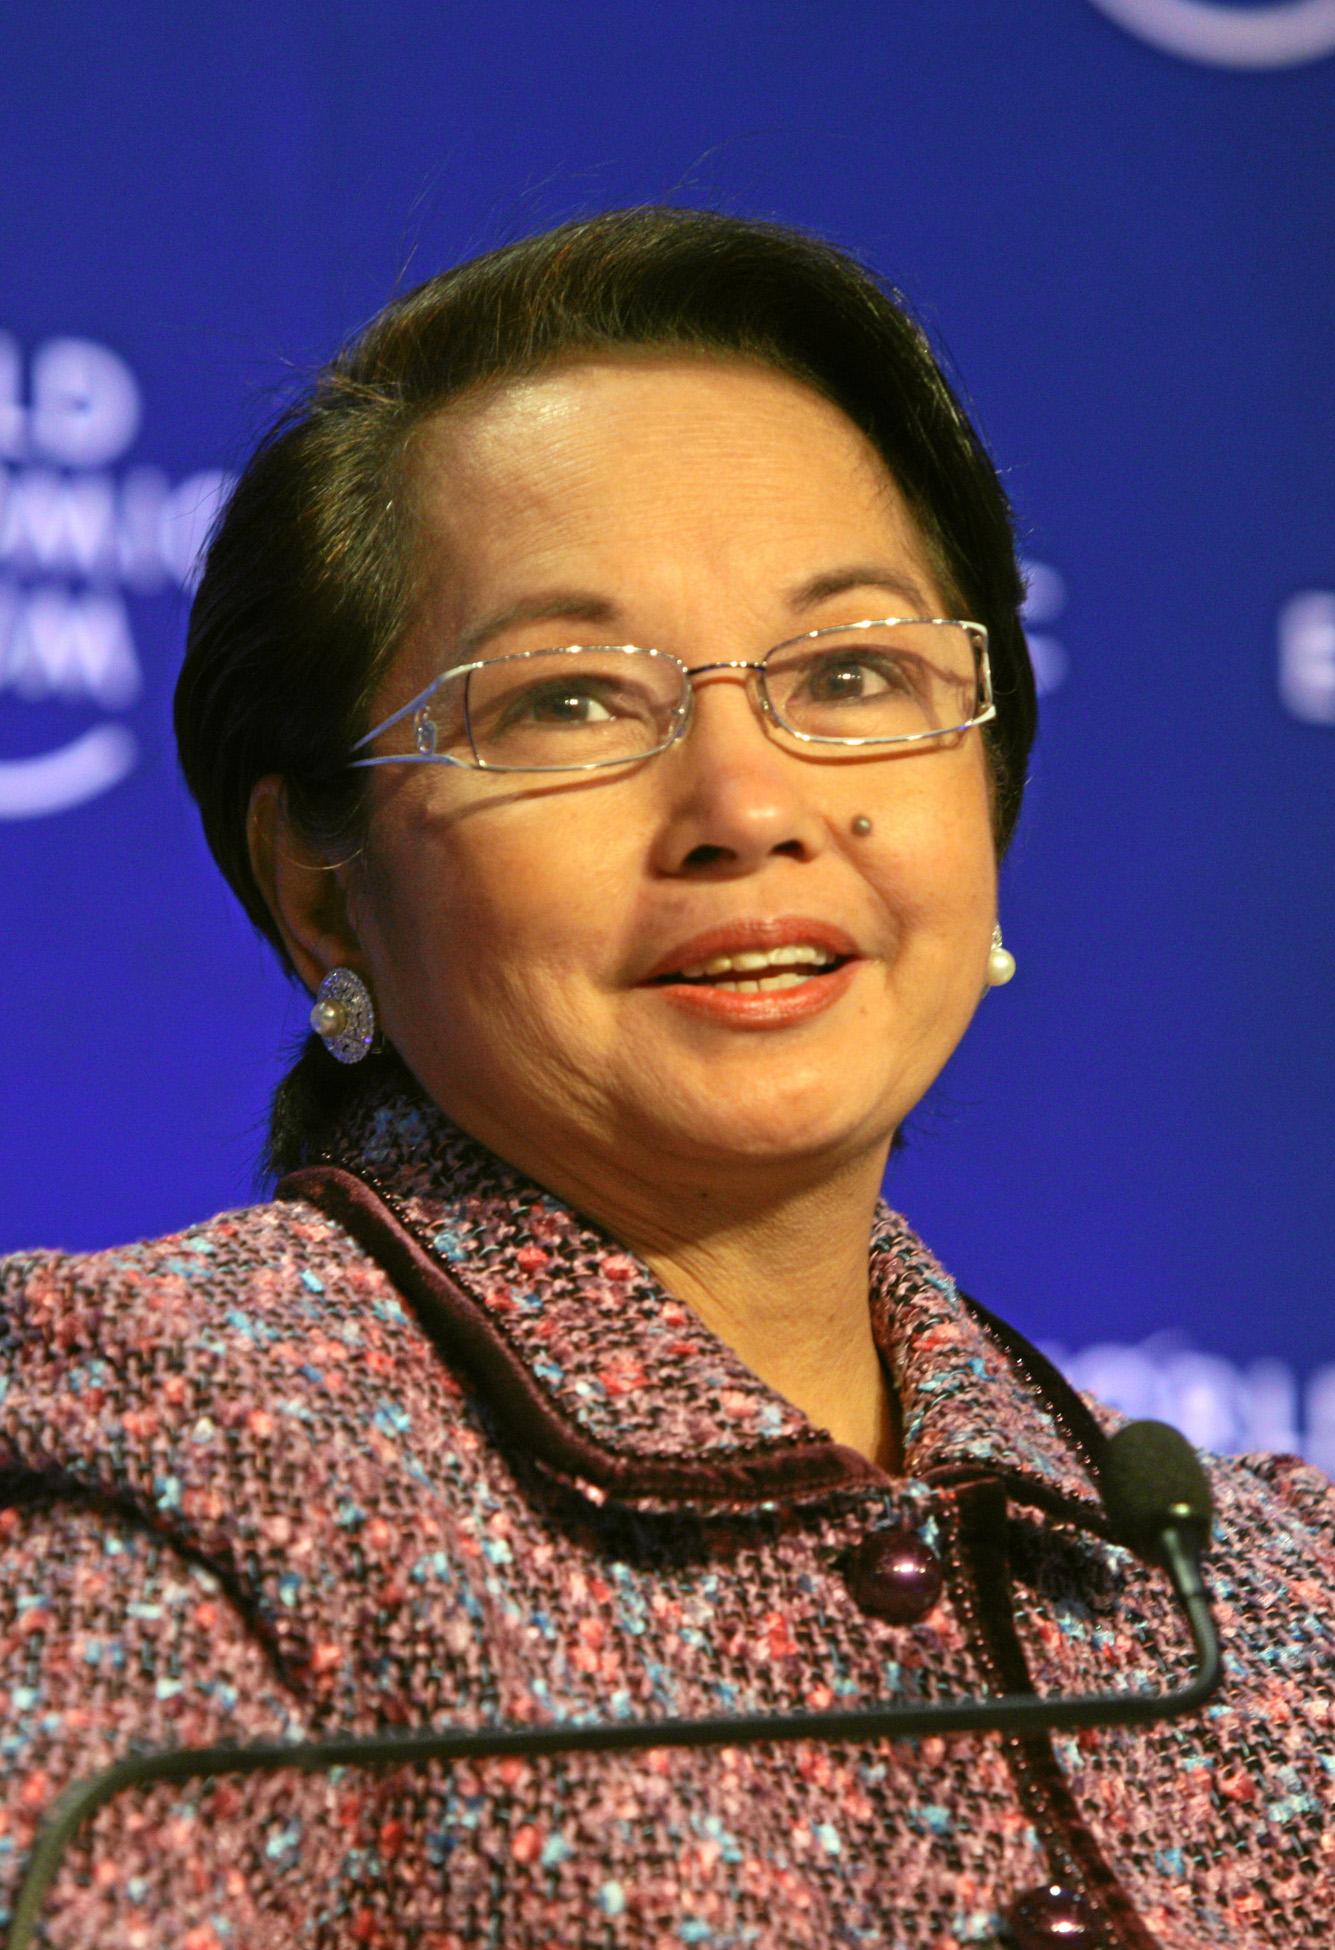 Castro: Arroyo treats all solons equally